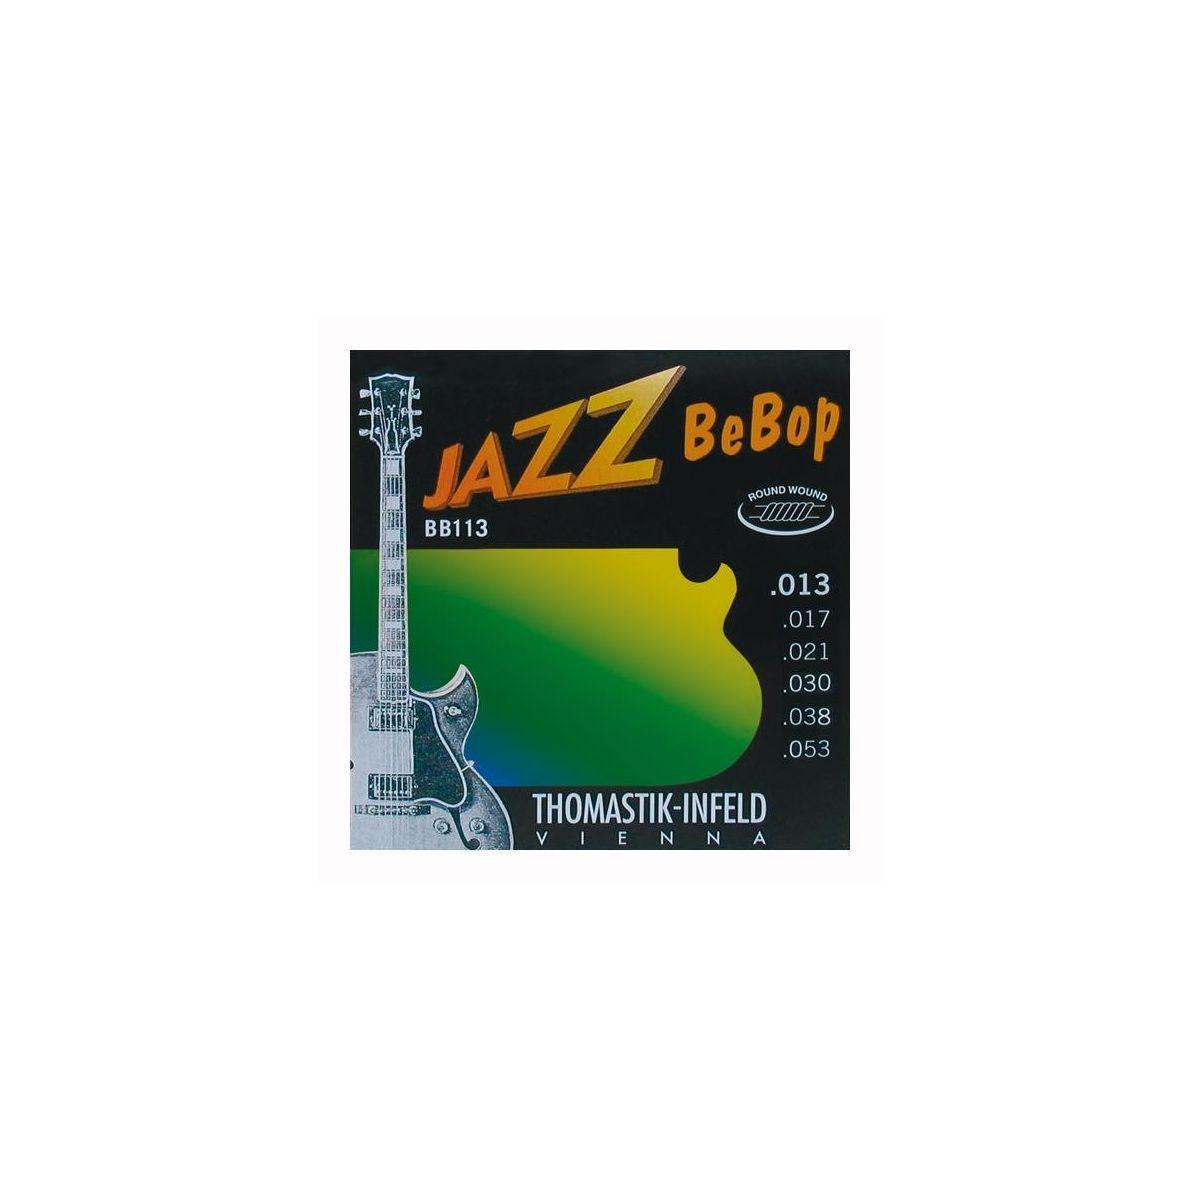 Corde Thomastik Jazz Bepop BB113